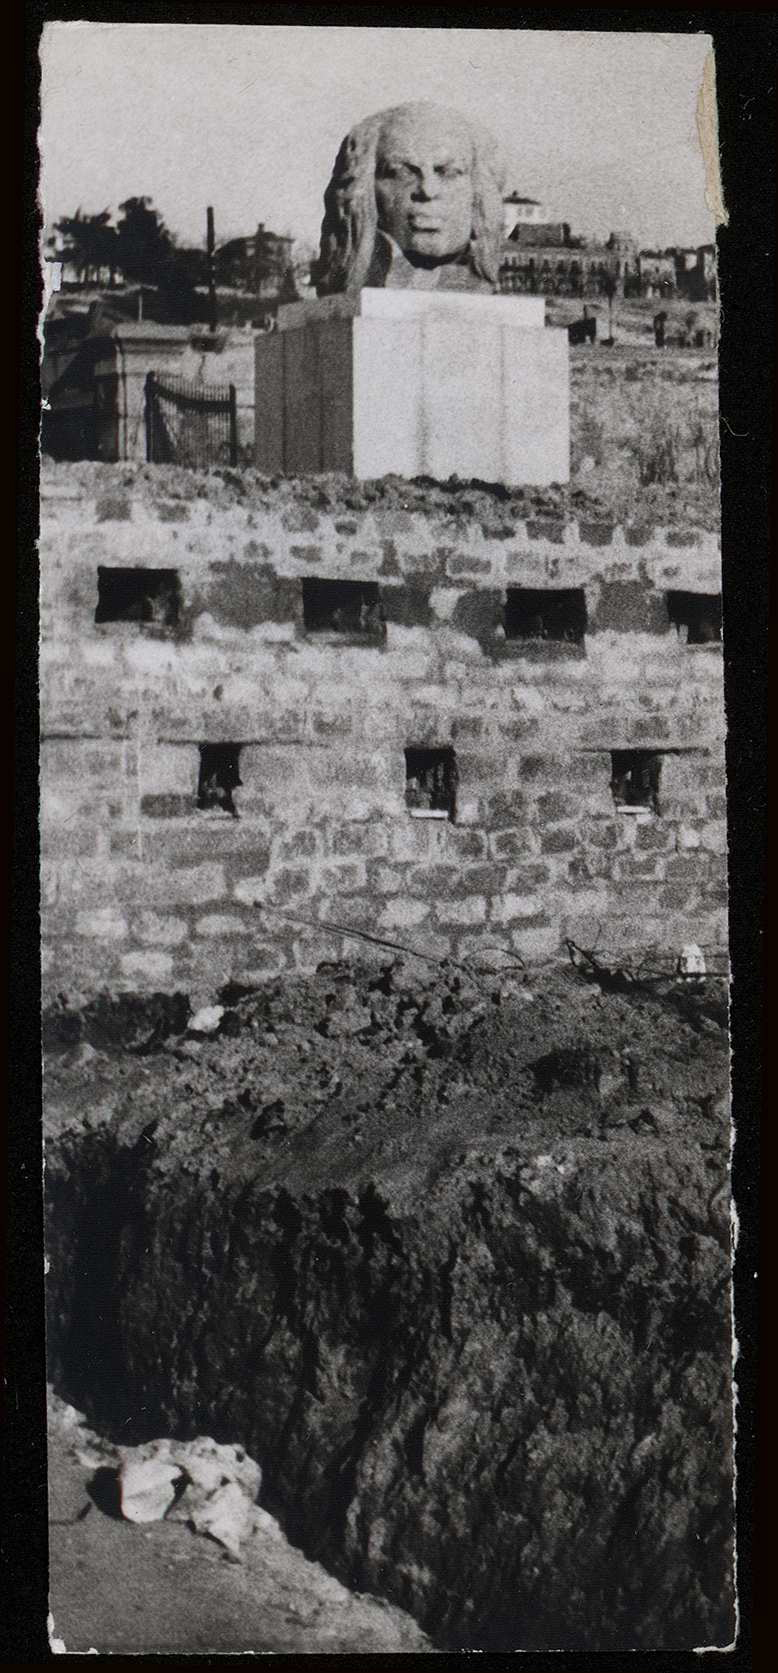 Goya parapetado. San Antonio de la Florida (1936). Fotografía: Mayo